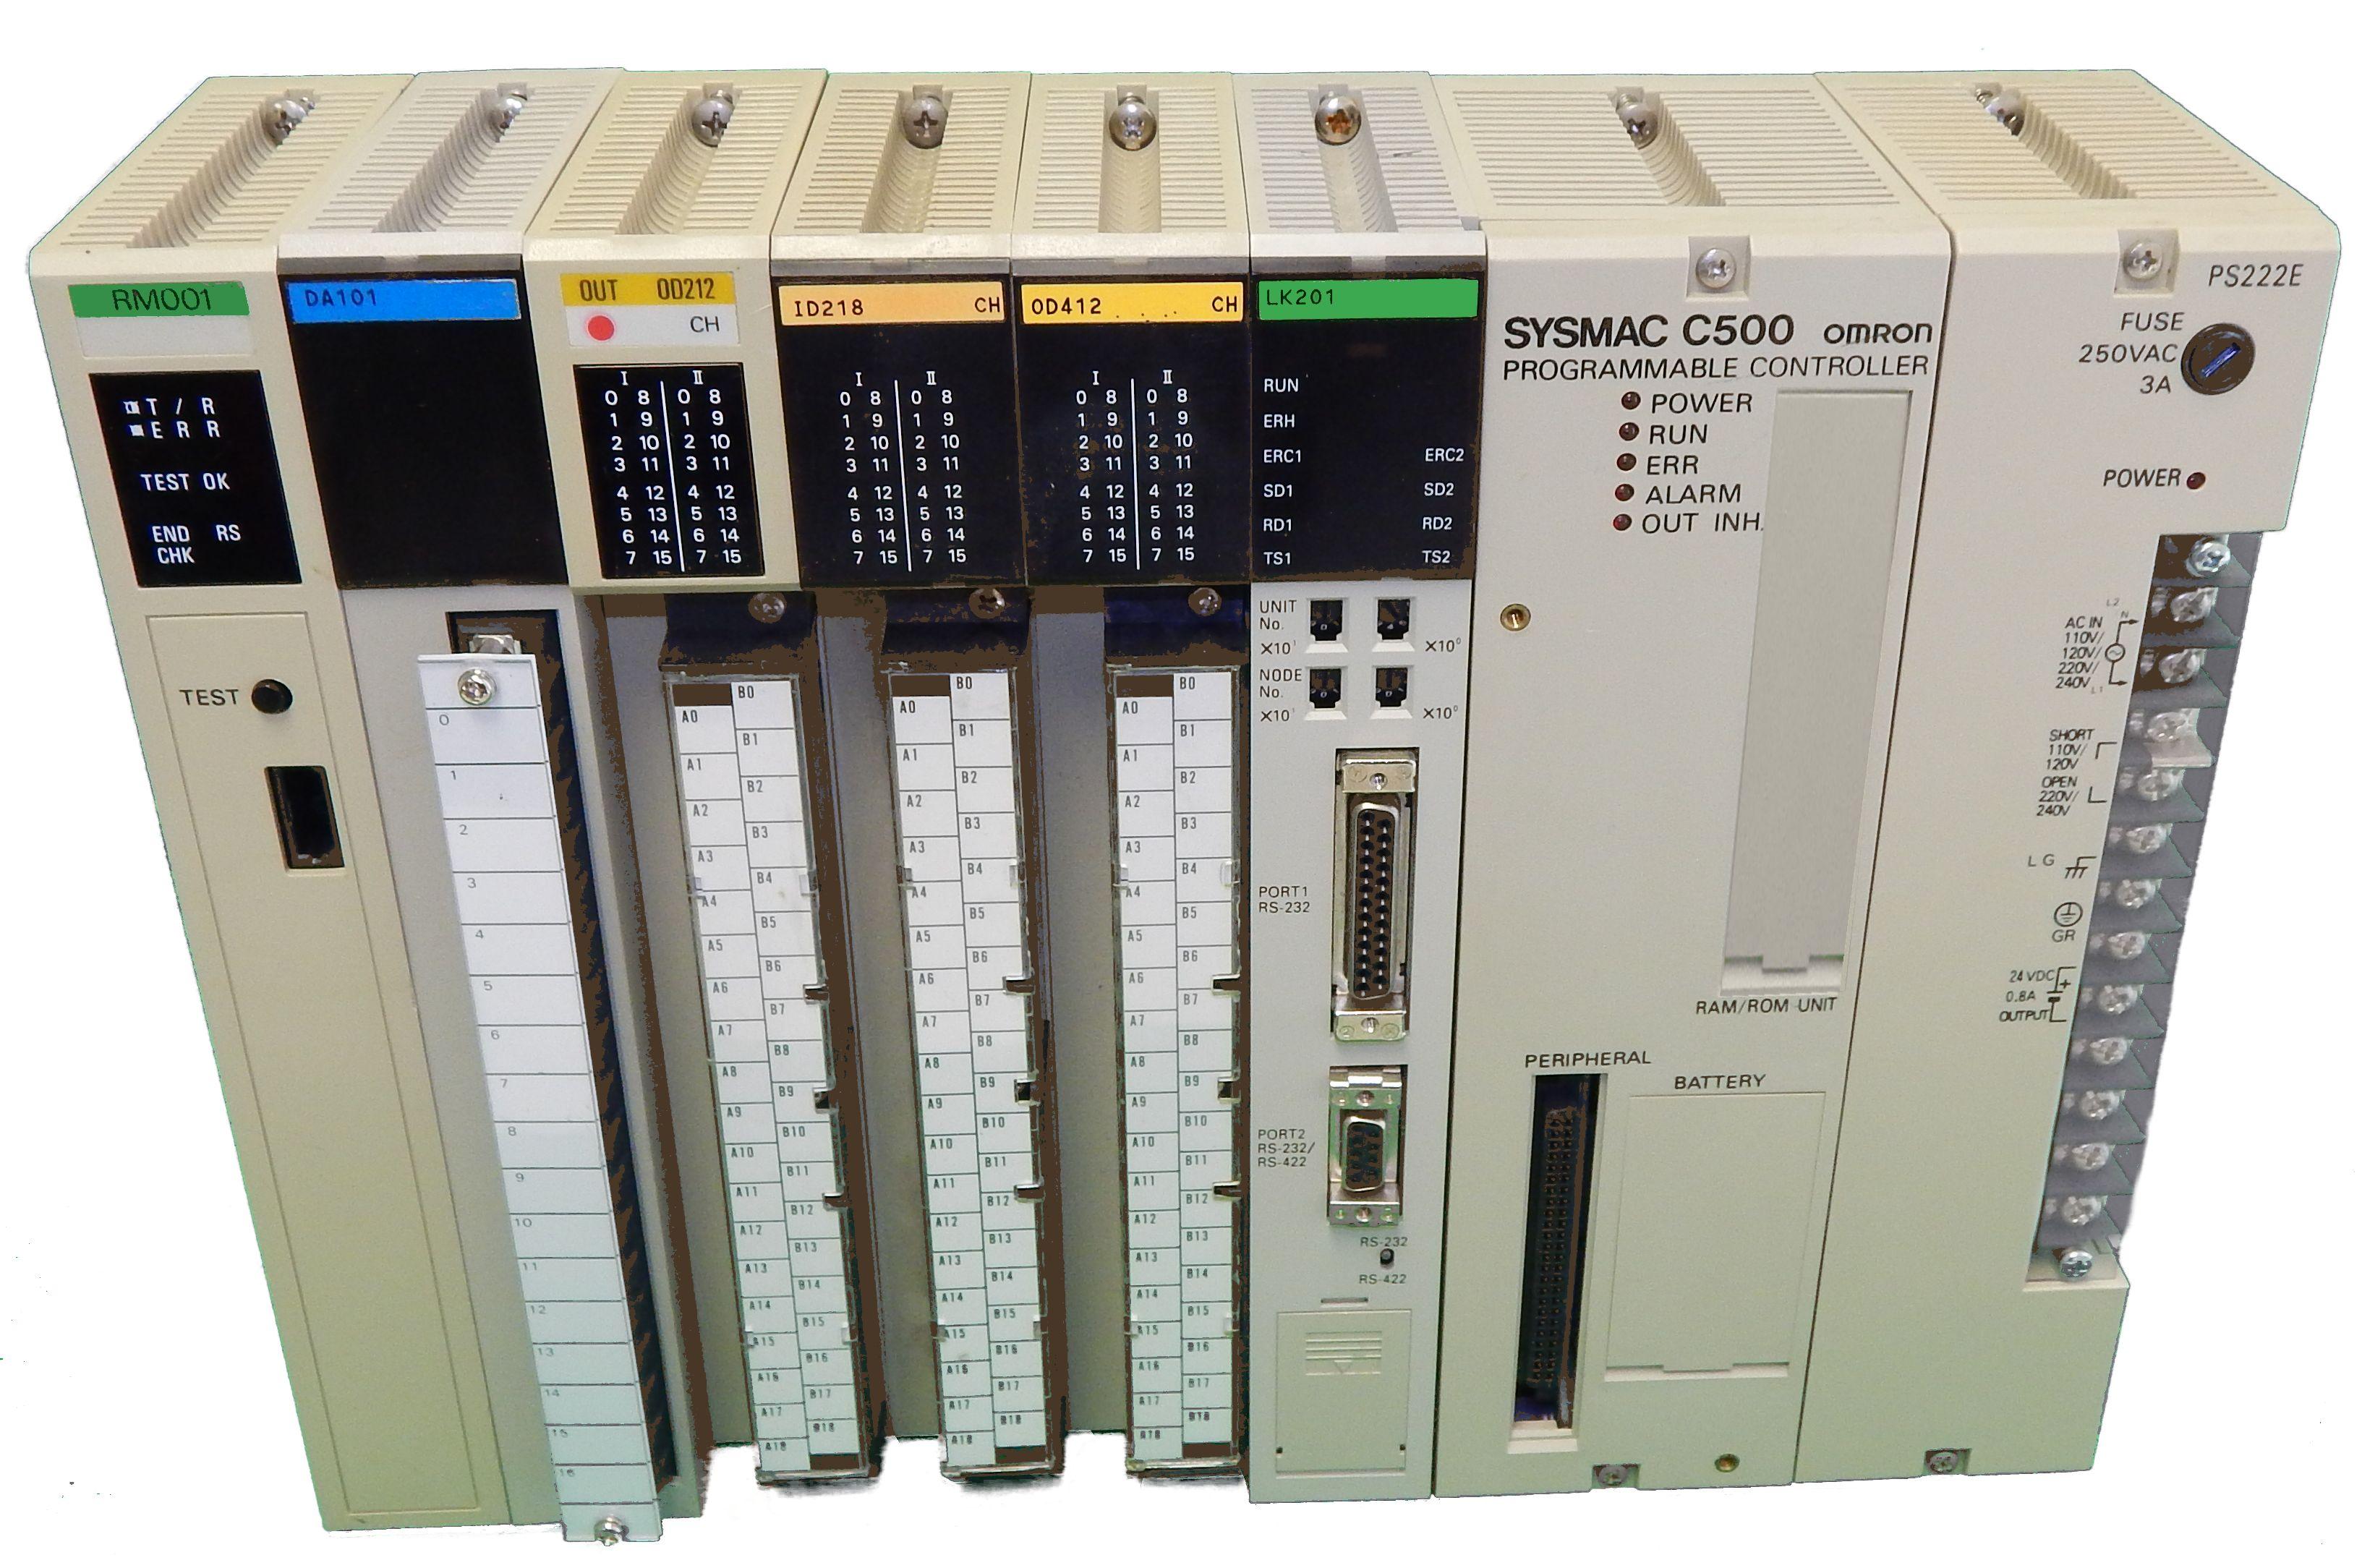 3G2C5-MR141-V1